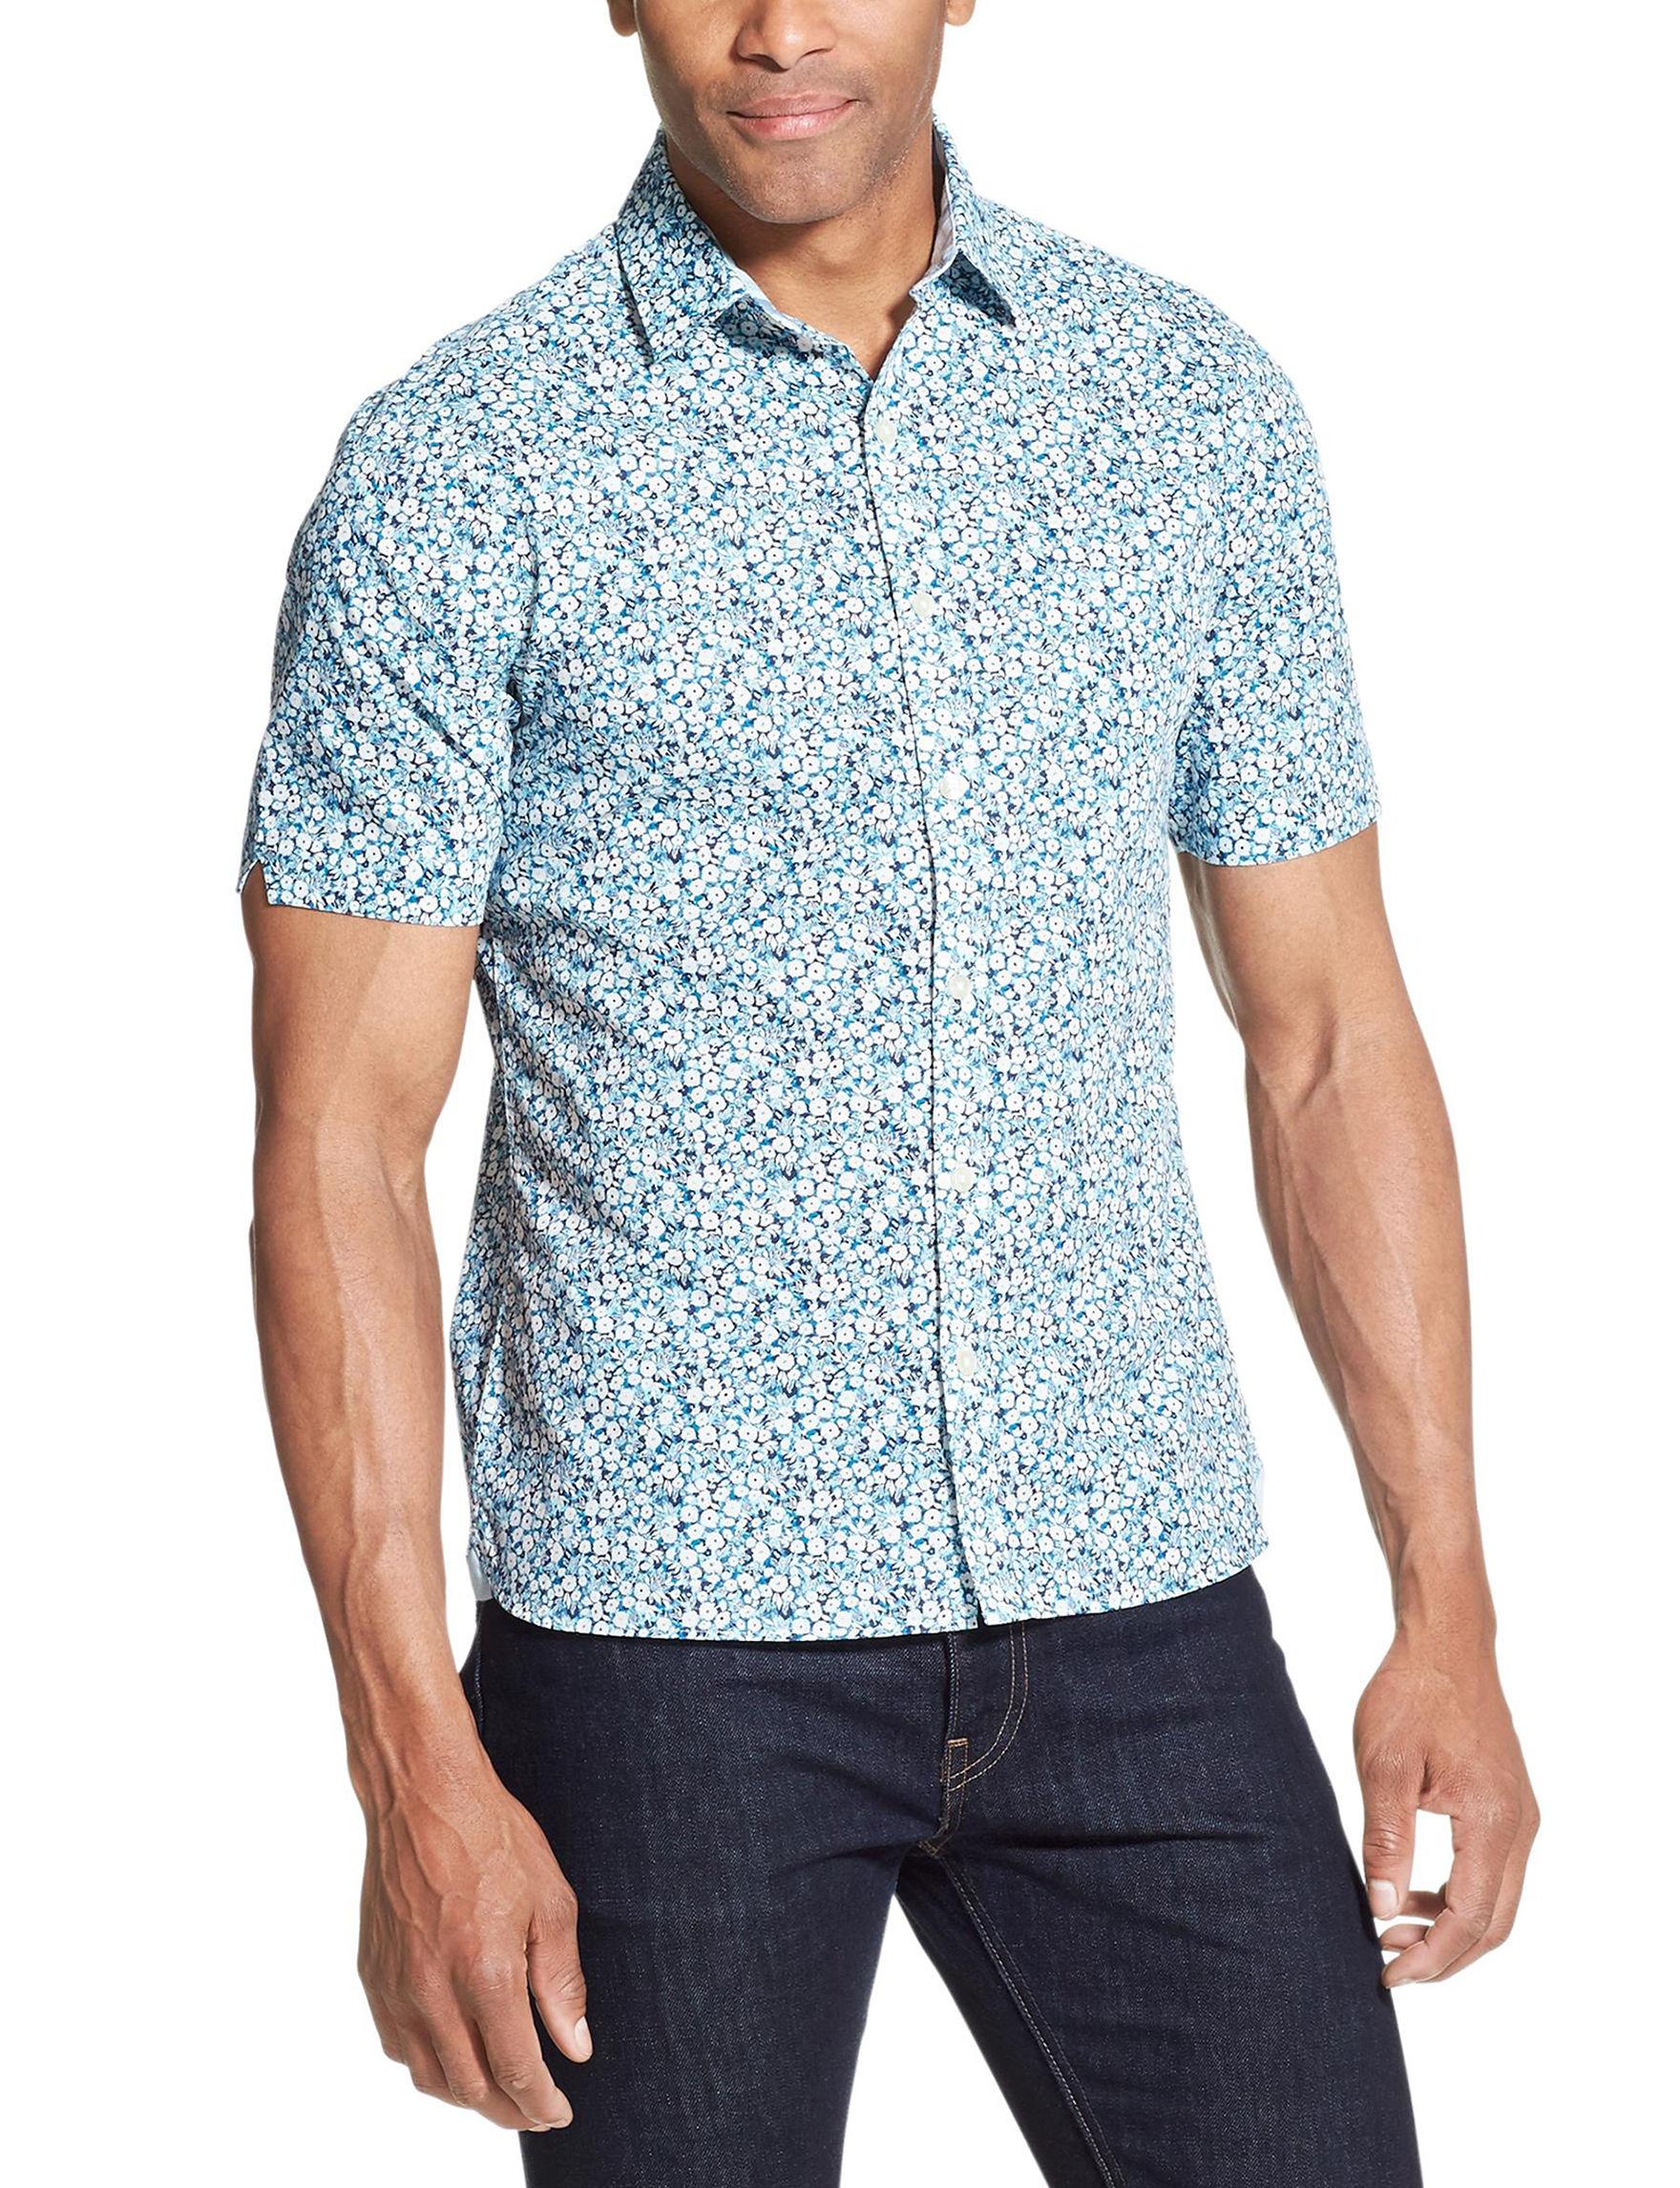 Van Heusen Stone Casual Button Down Shirts